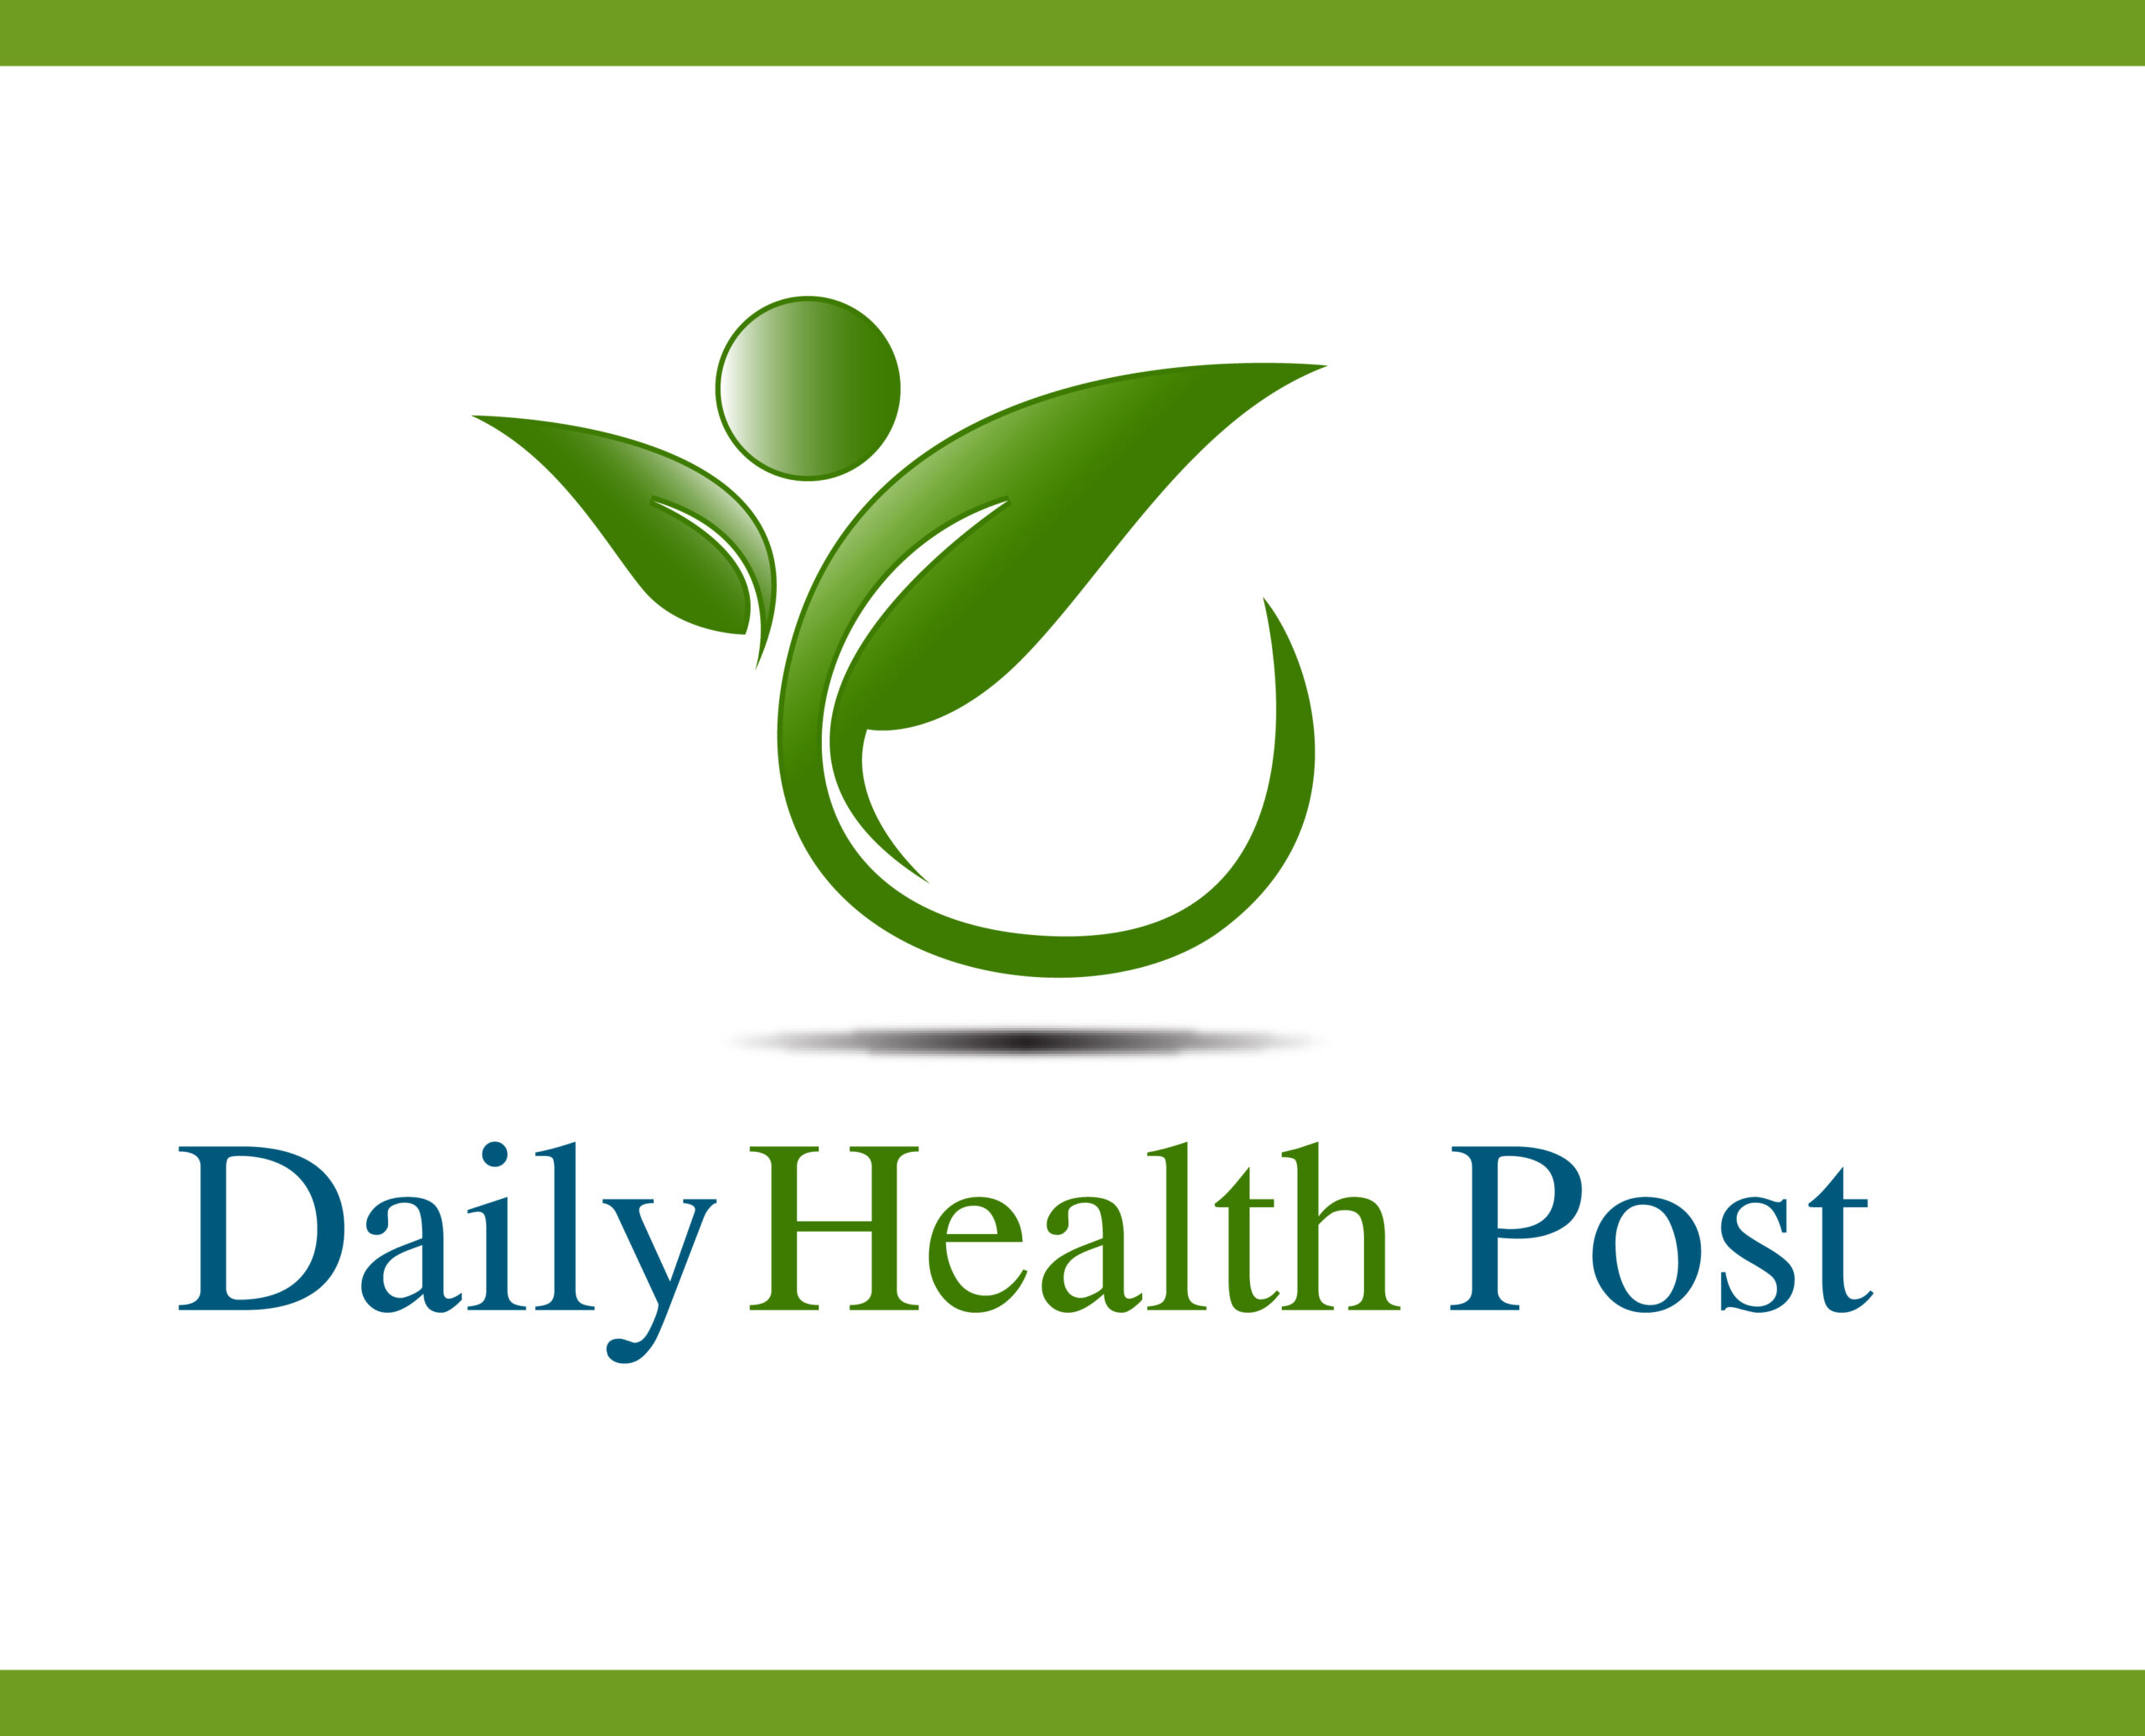 Custom Medical Treatment Logo Template Free Download